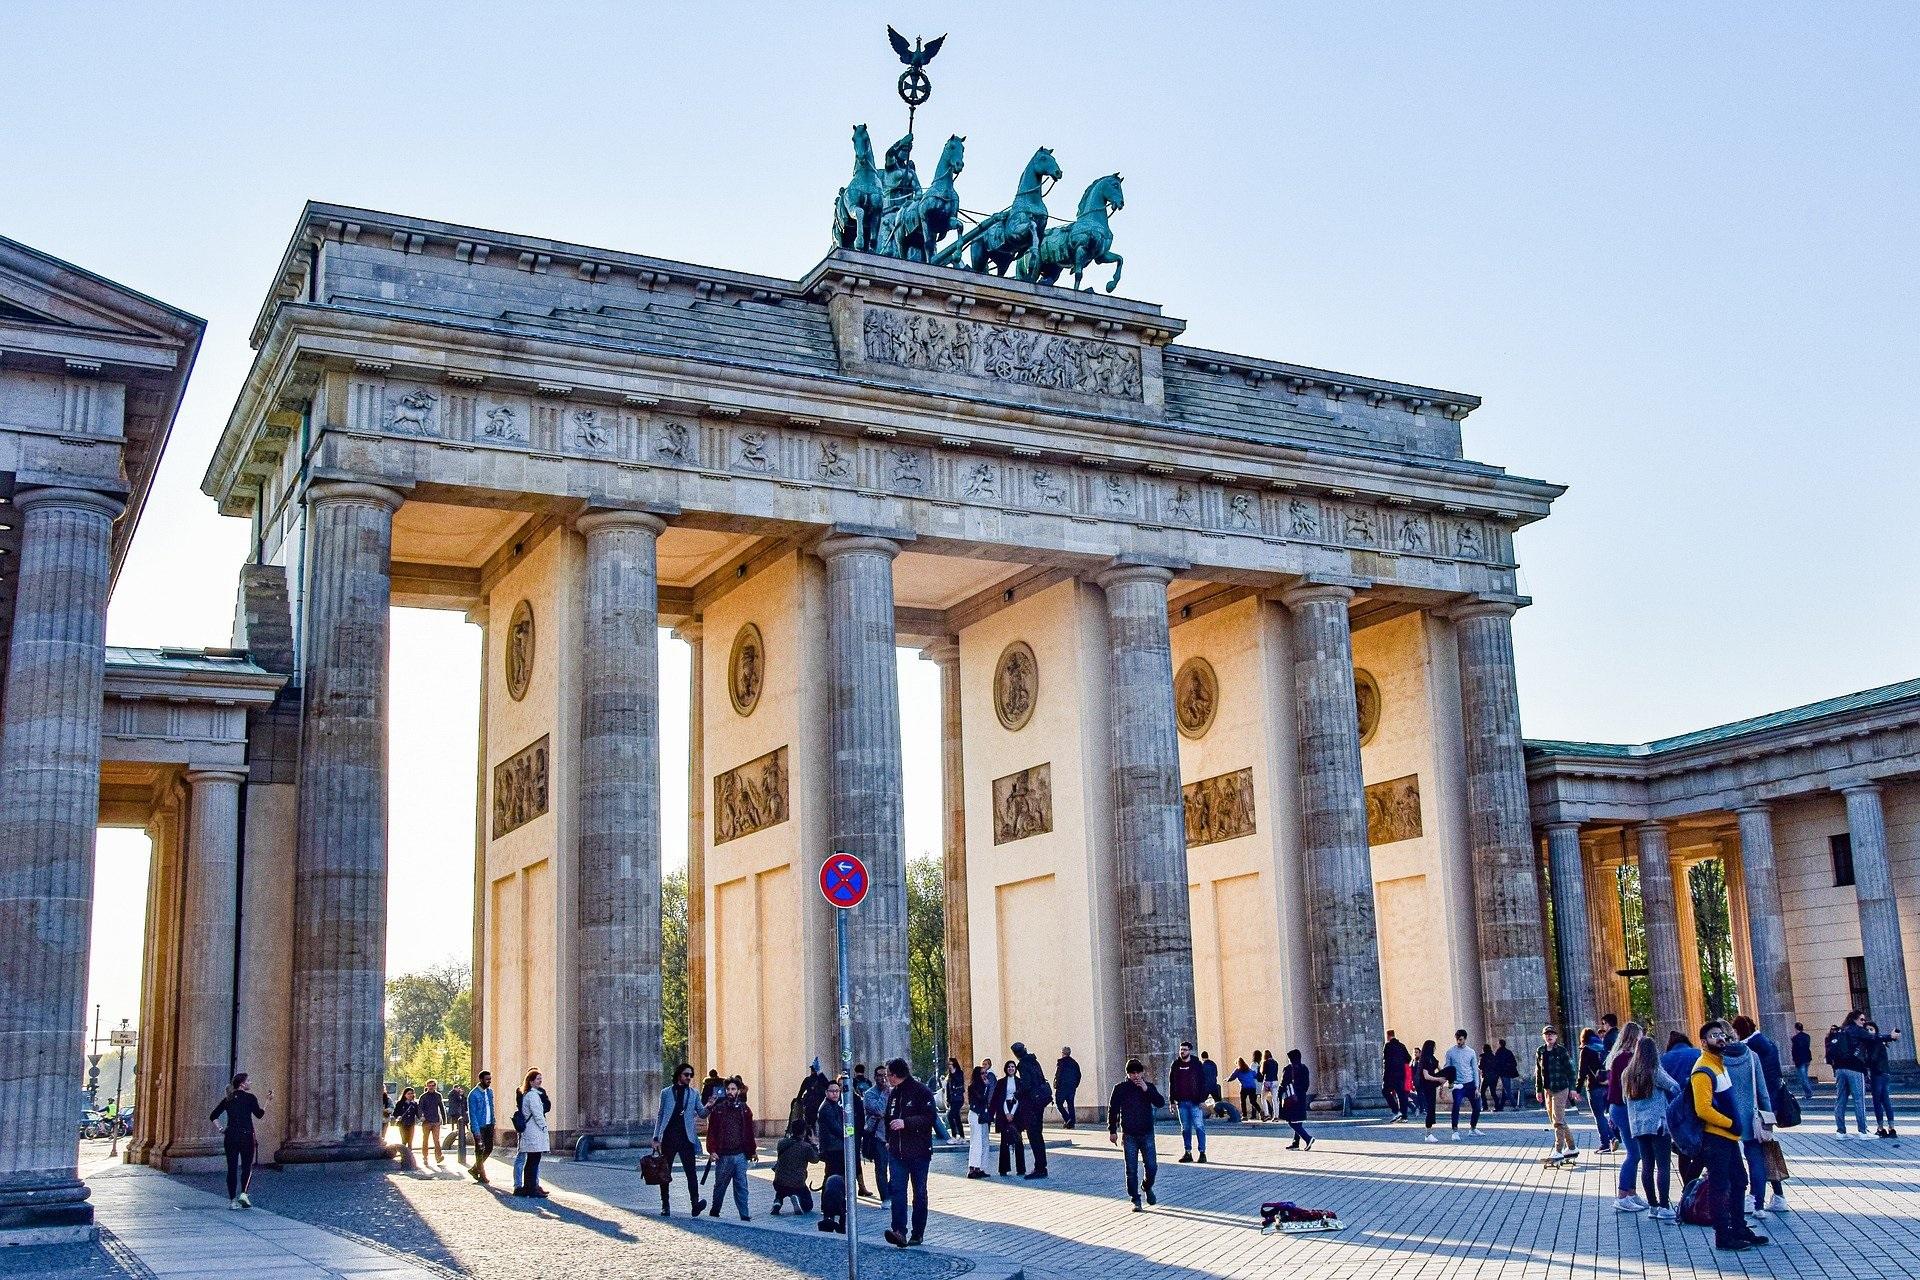 brand-front-of-the-brandenburg-gate-5117579_1920